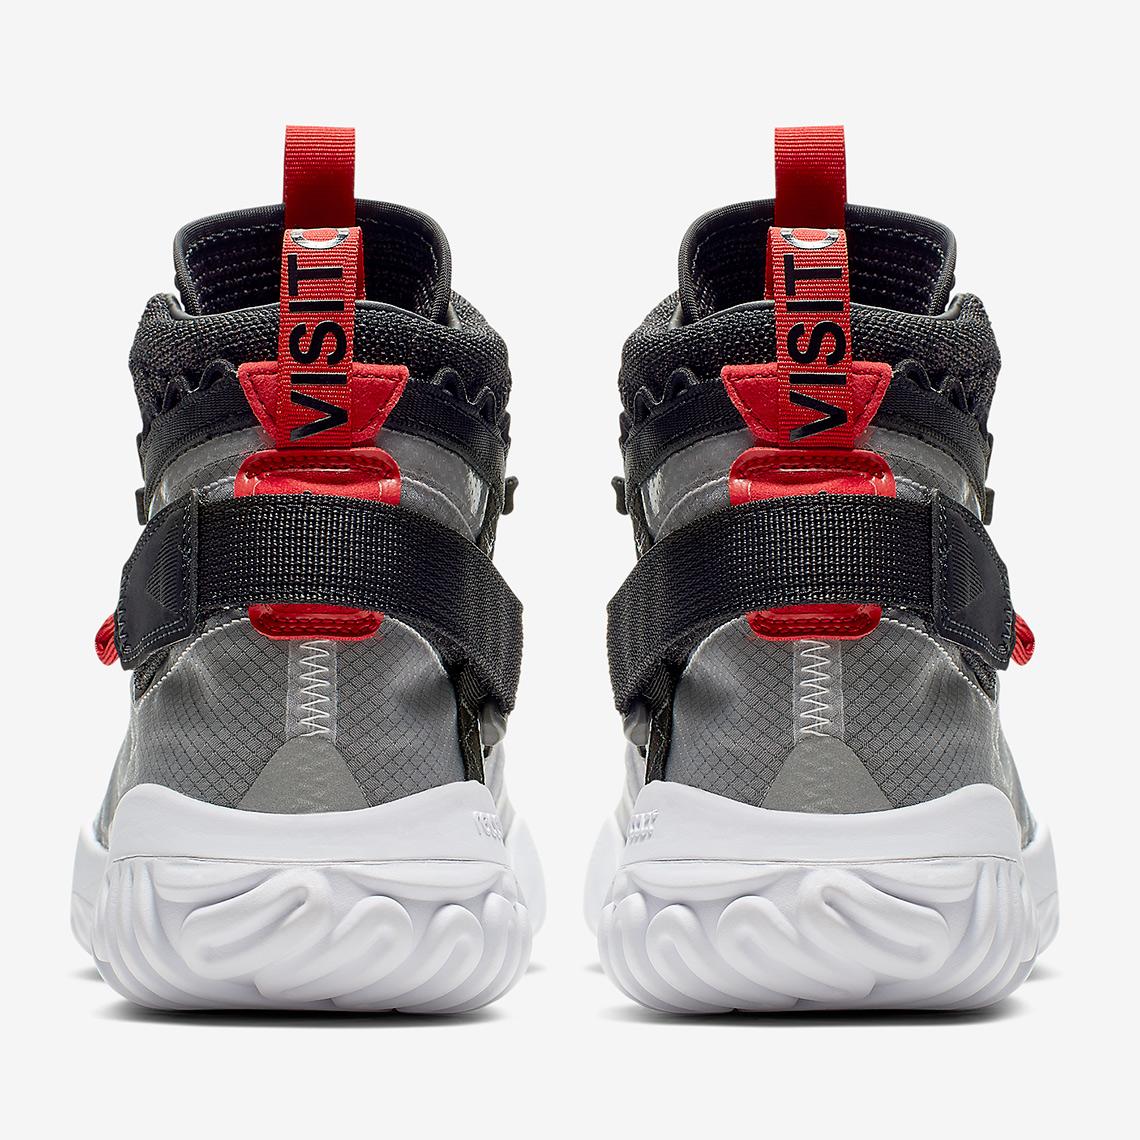 a70ecd891a2 Jordan Apex Utility BQ7147-006 Release Details | SneakerNews.com